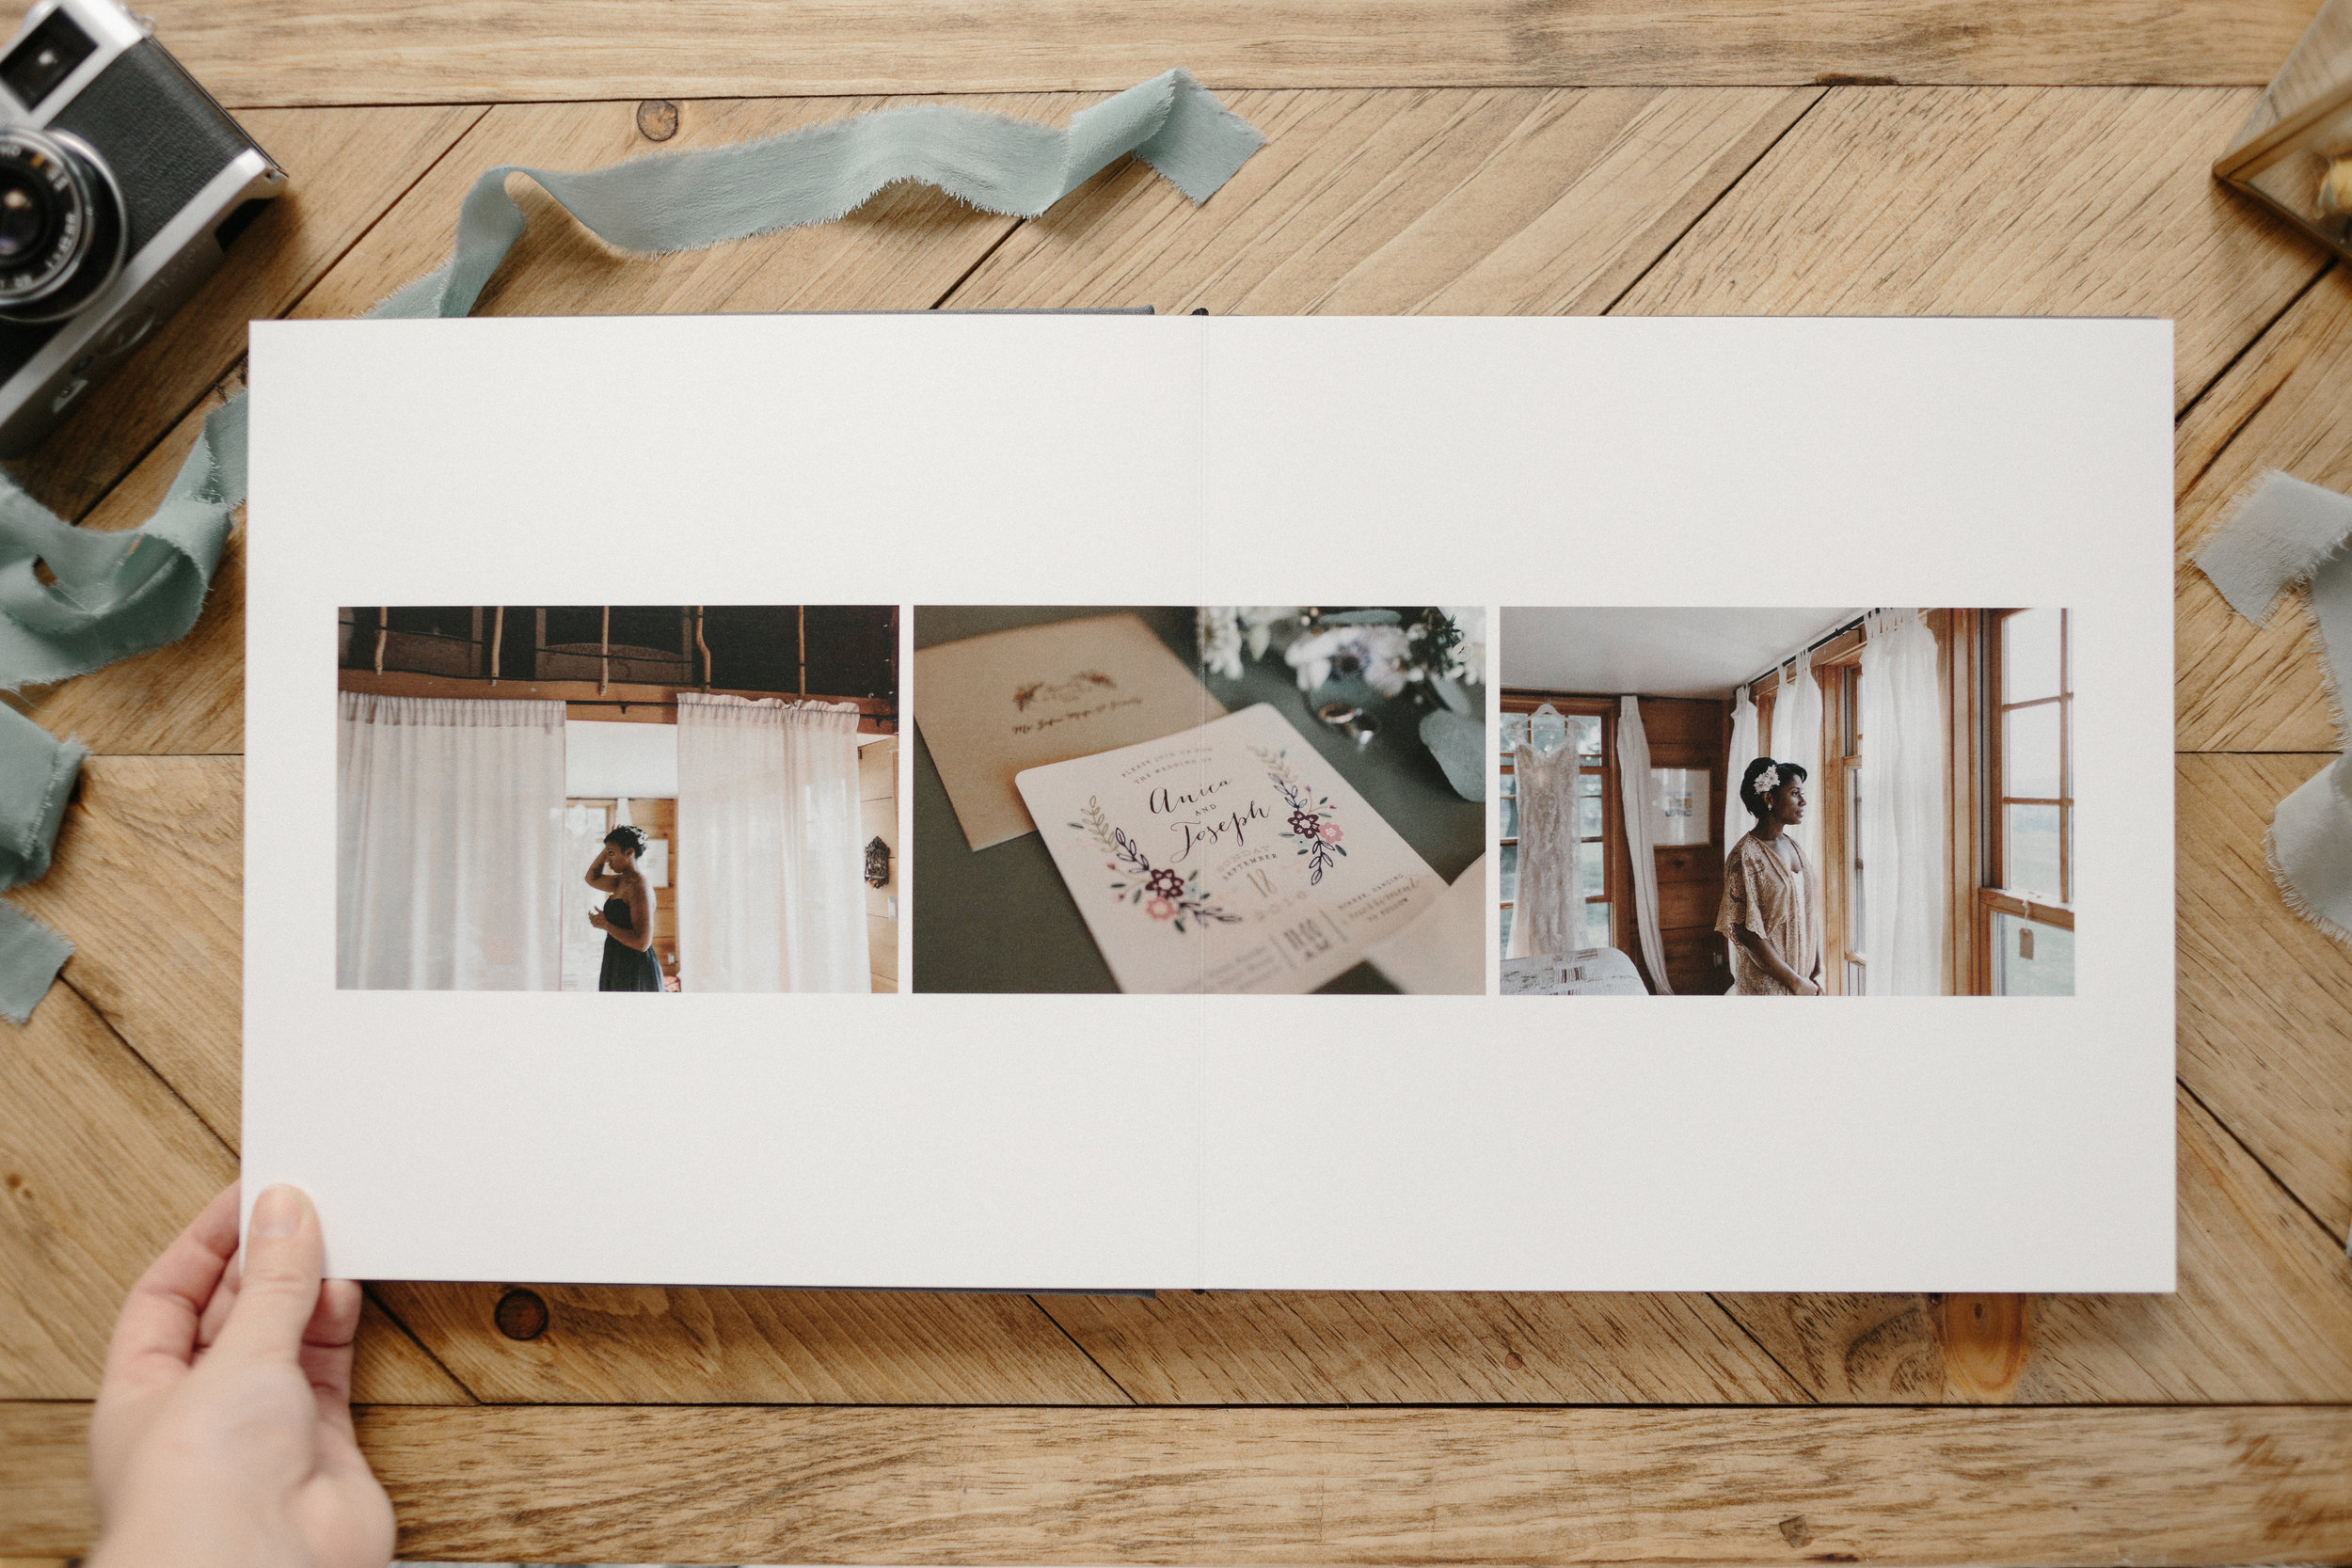 ryanne-hollies-photography-wedding-album-design-details-tono-and-co-artifact-uprising-95.jpg